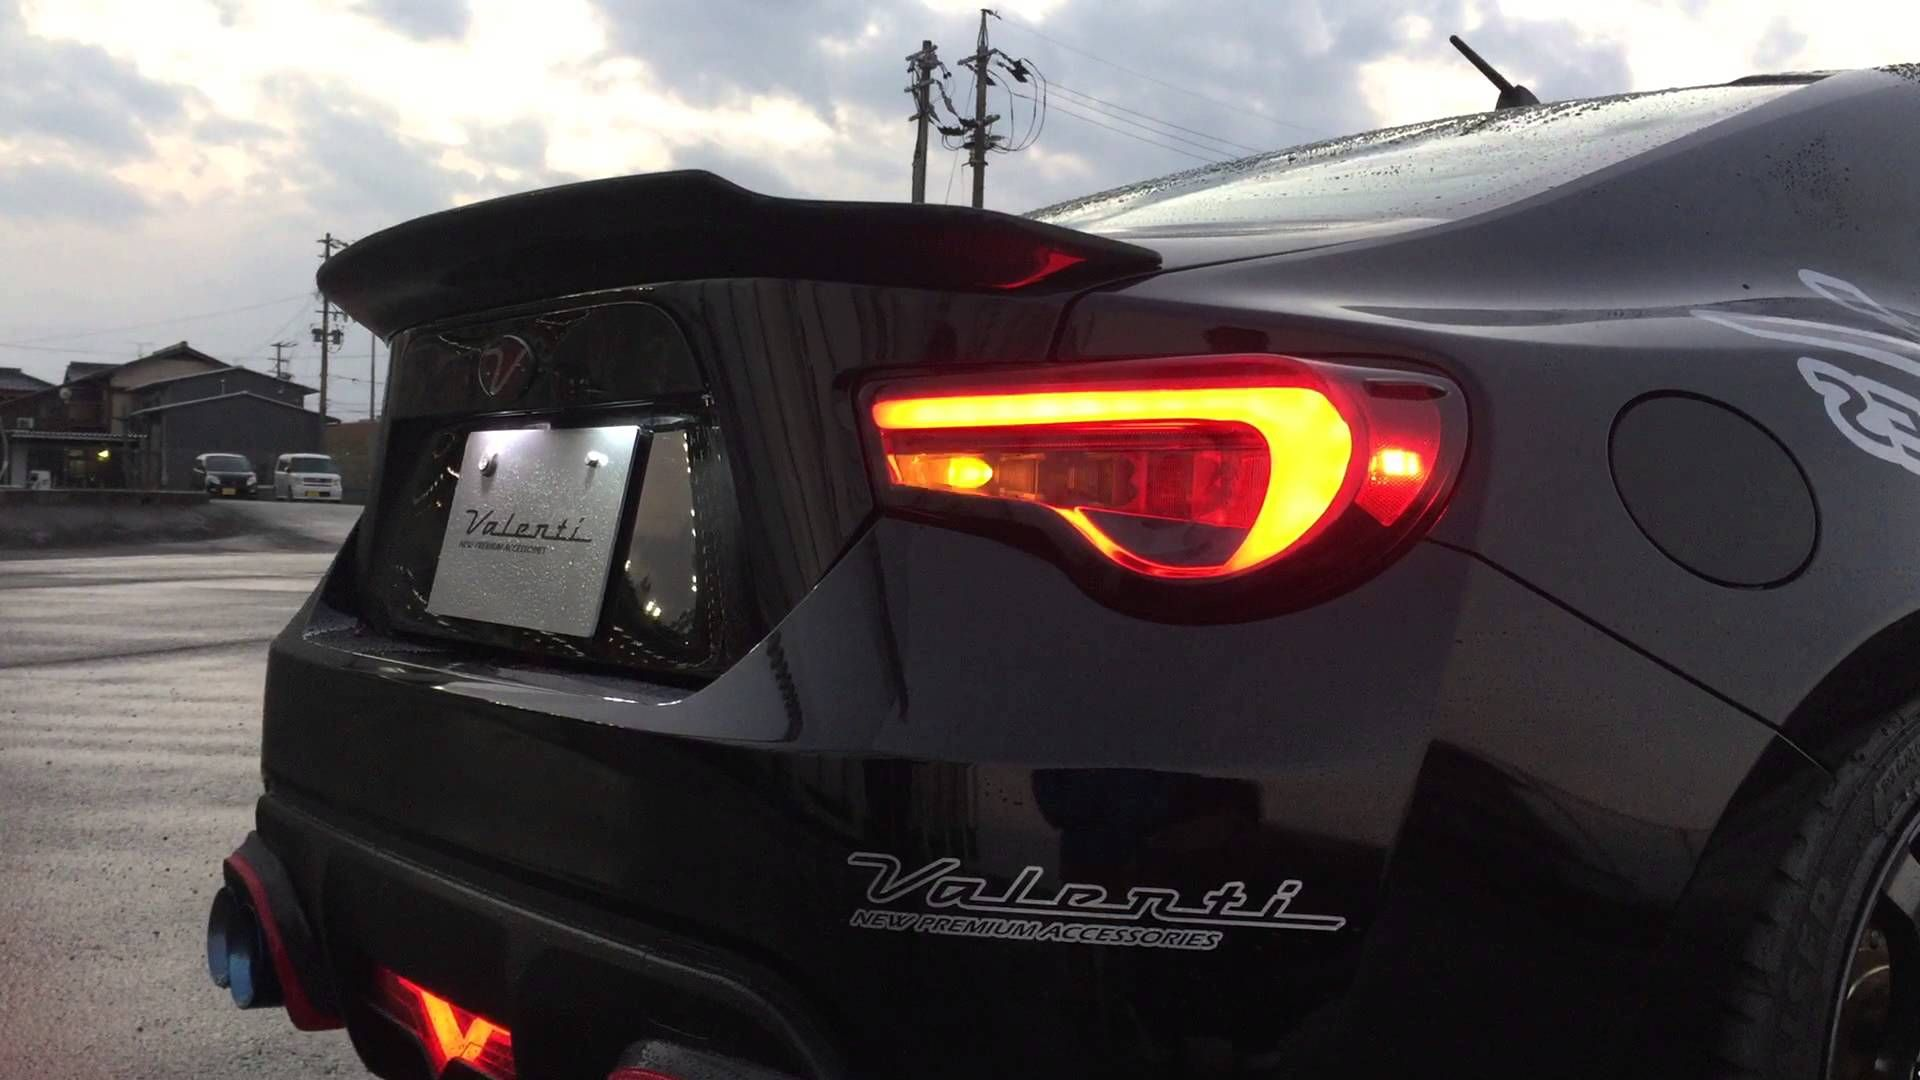 Valenti Jewel Led Tail Lamp Revo For86 Brz Frs Vehicles Tail Light